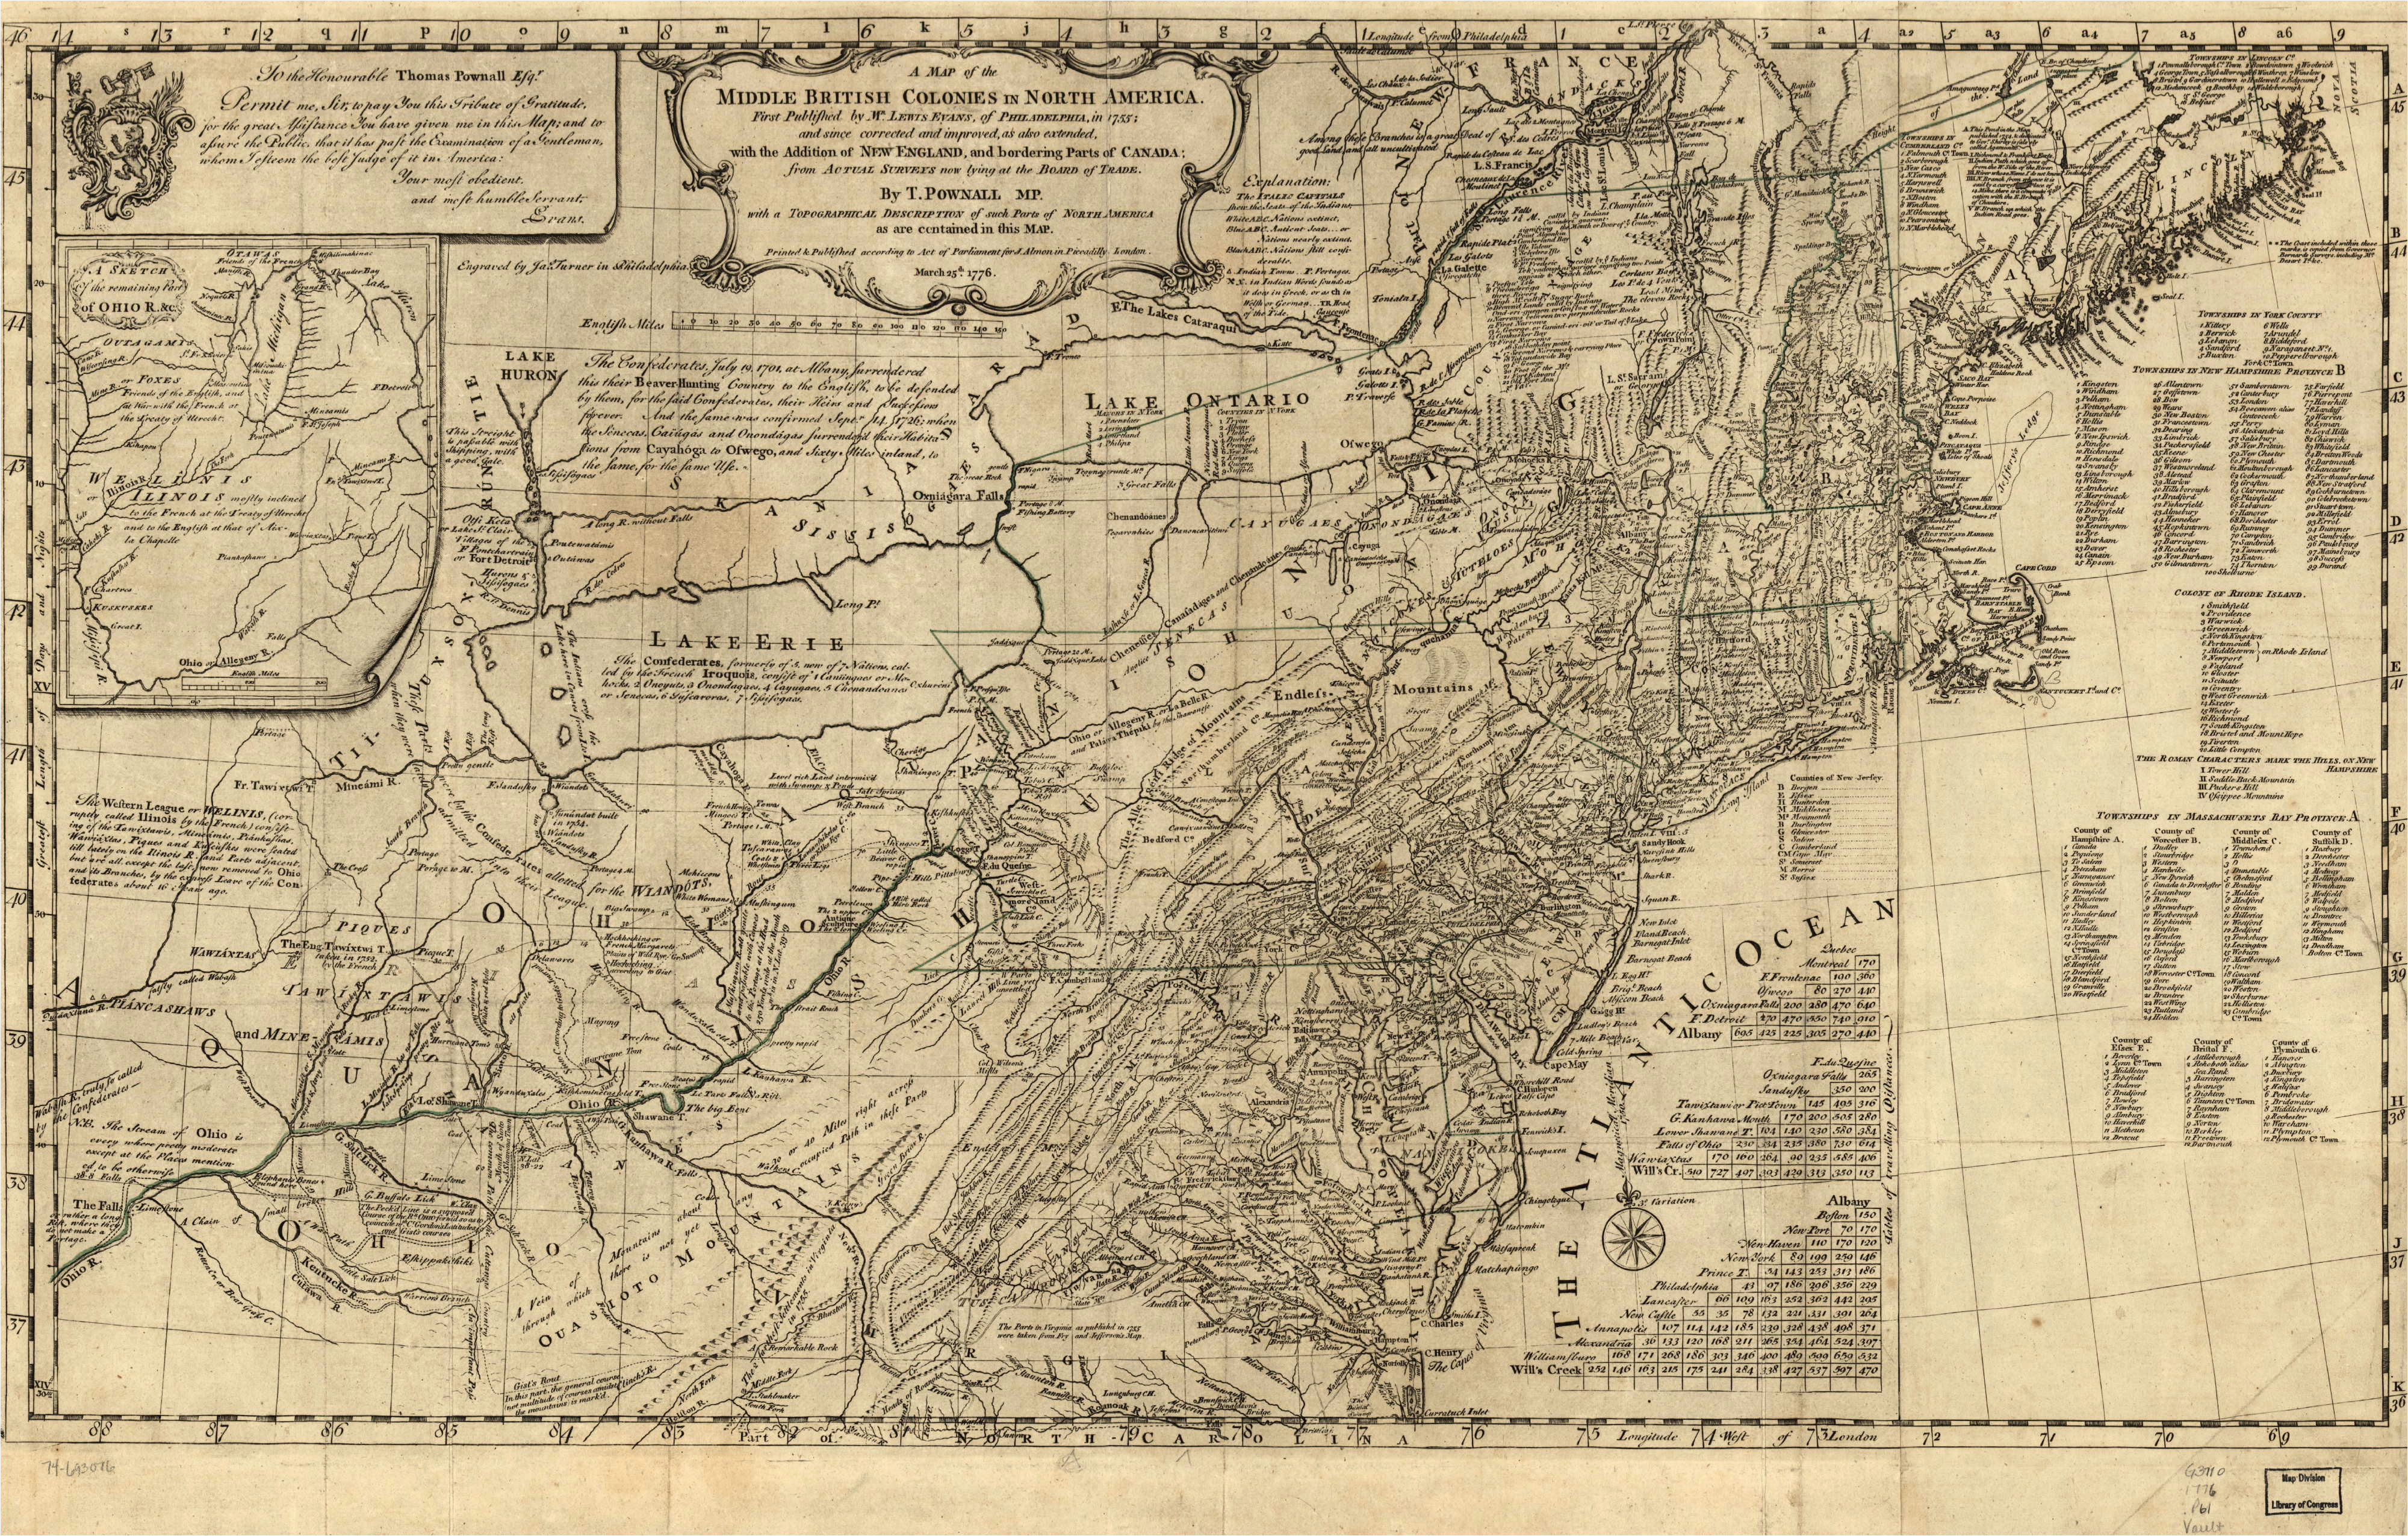 Ohio Pennsylvania County Map 1775 to 1779 Pennsylvania Maps ... on central pa map, chester pa map, pa topo map, lancaster pa map, pa municipal map, pa township map, pa zip code map, fenelton pa map, york pa area map, lehighton pa map, penndot district map, pa elevation map, pa highway map, pa wmu map, pa region map, pa state map, pa river map, pa city map, clarion pa map, ebensburg pa map,